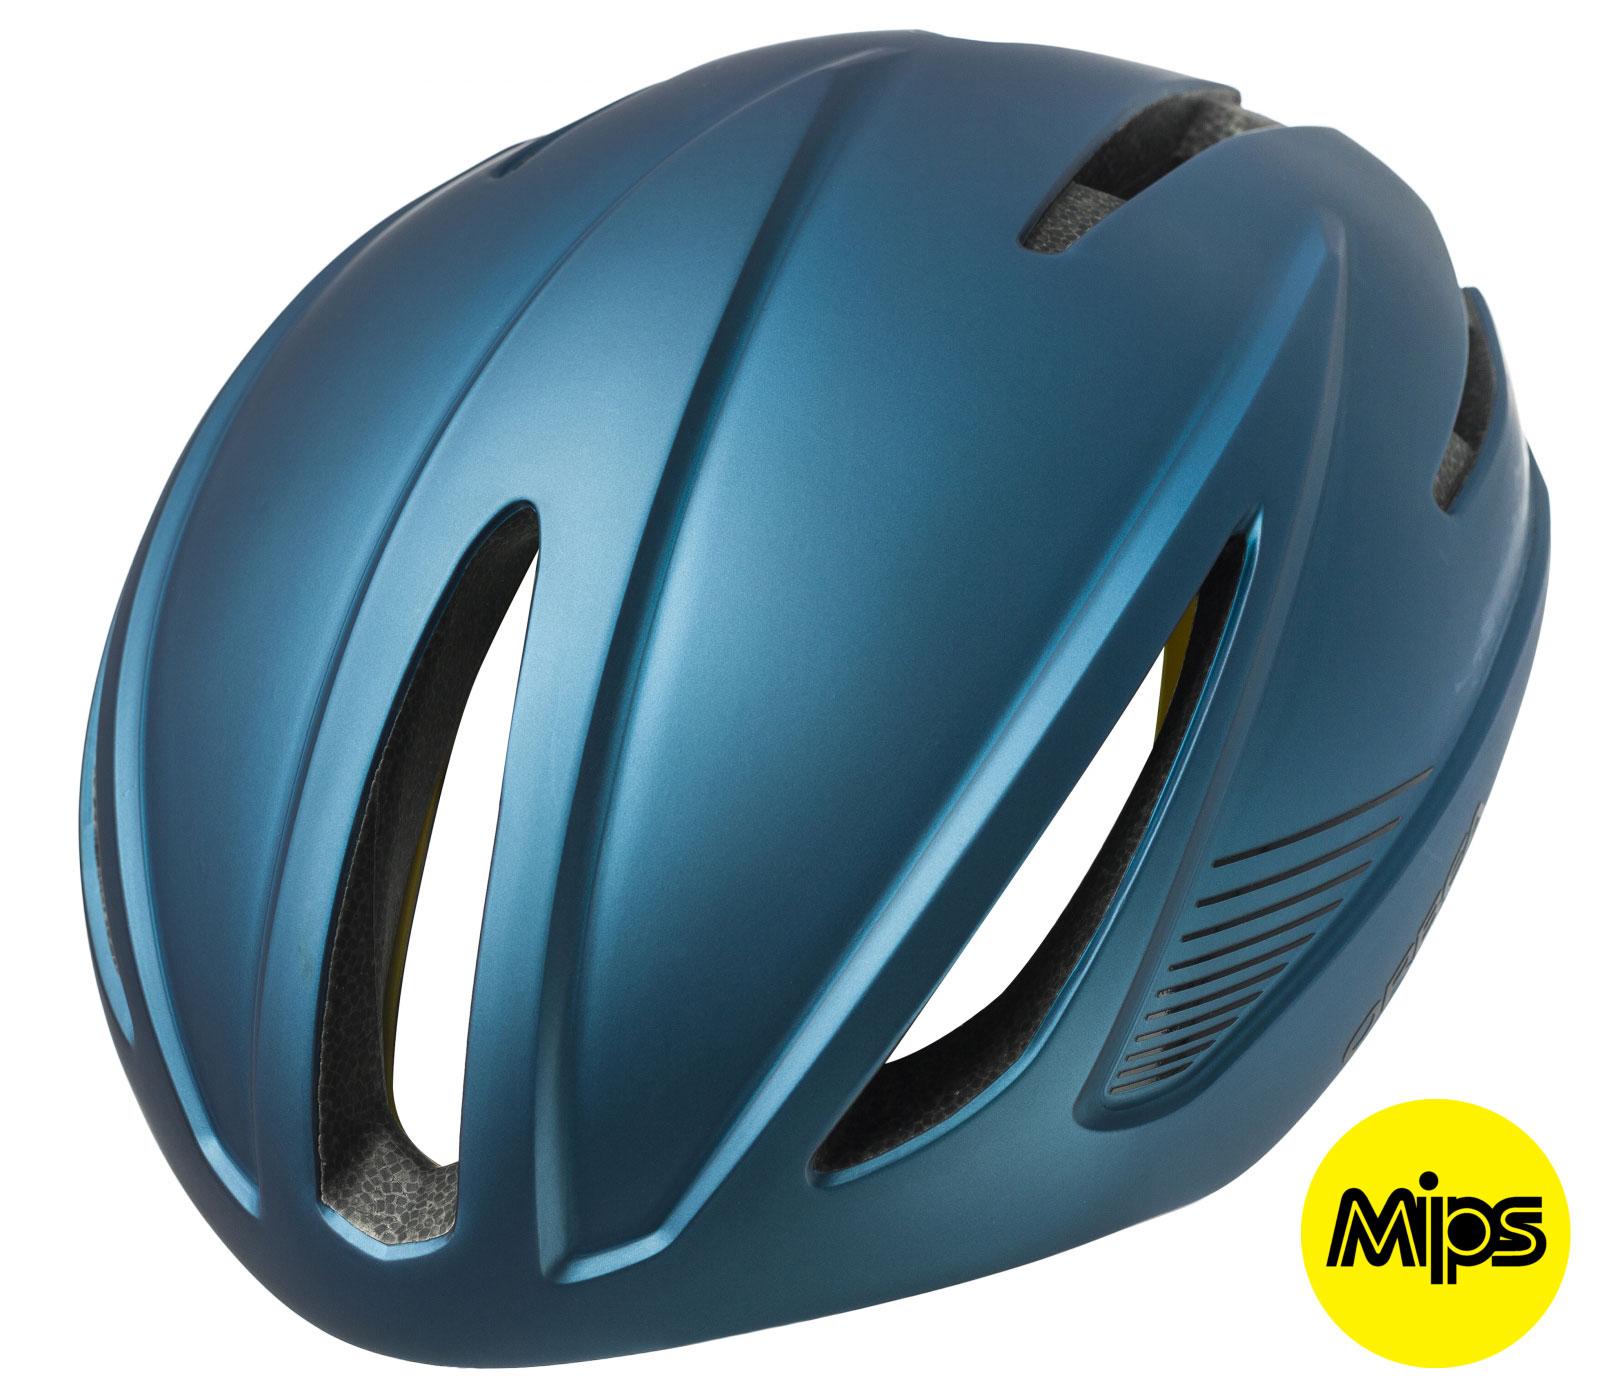 KACIGA ORBEA R10 AERO MIPS EU BLUE